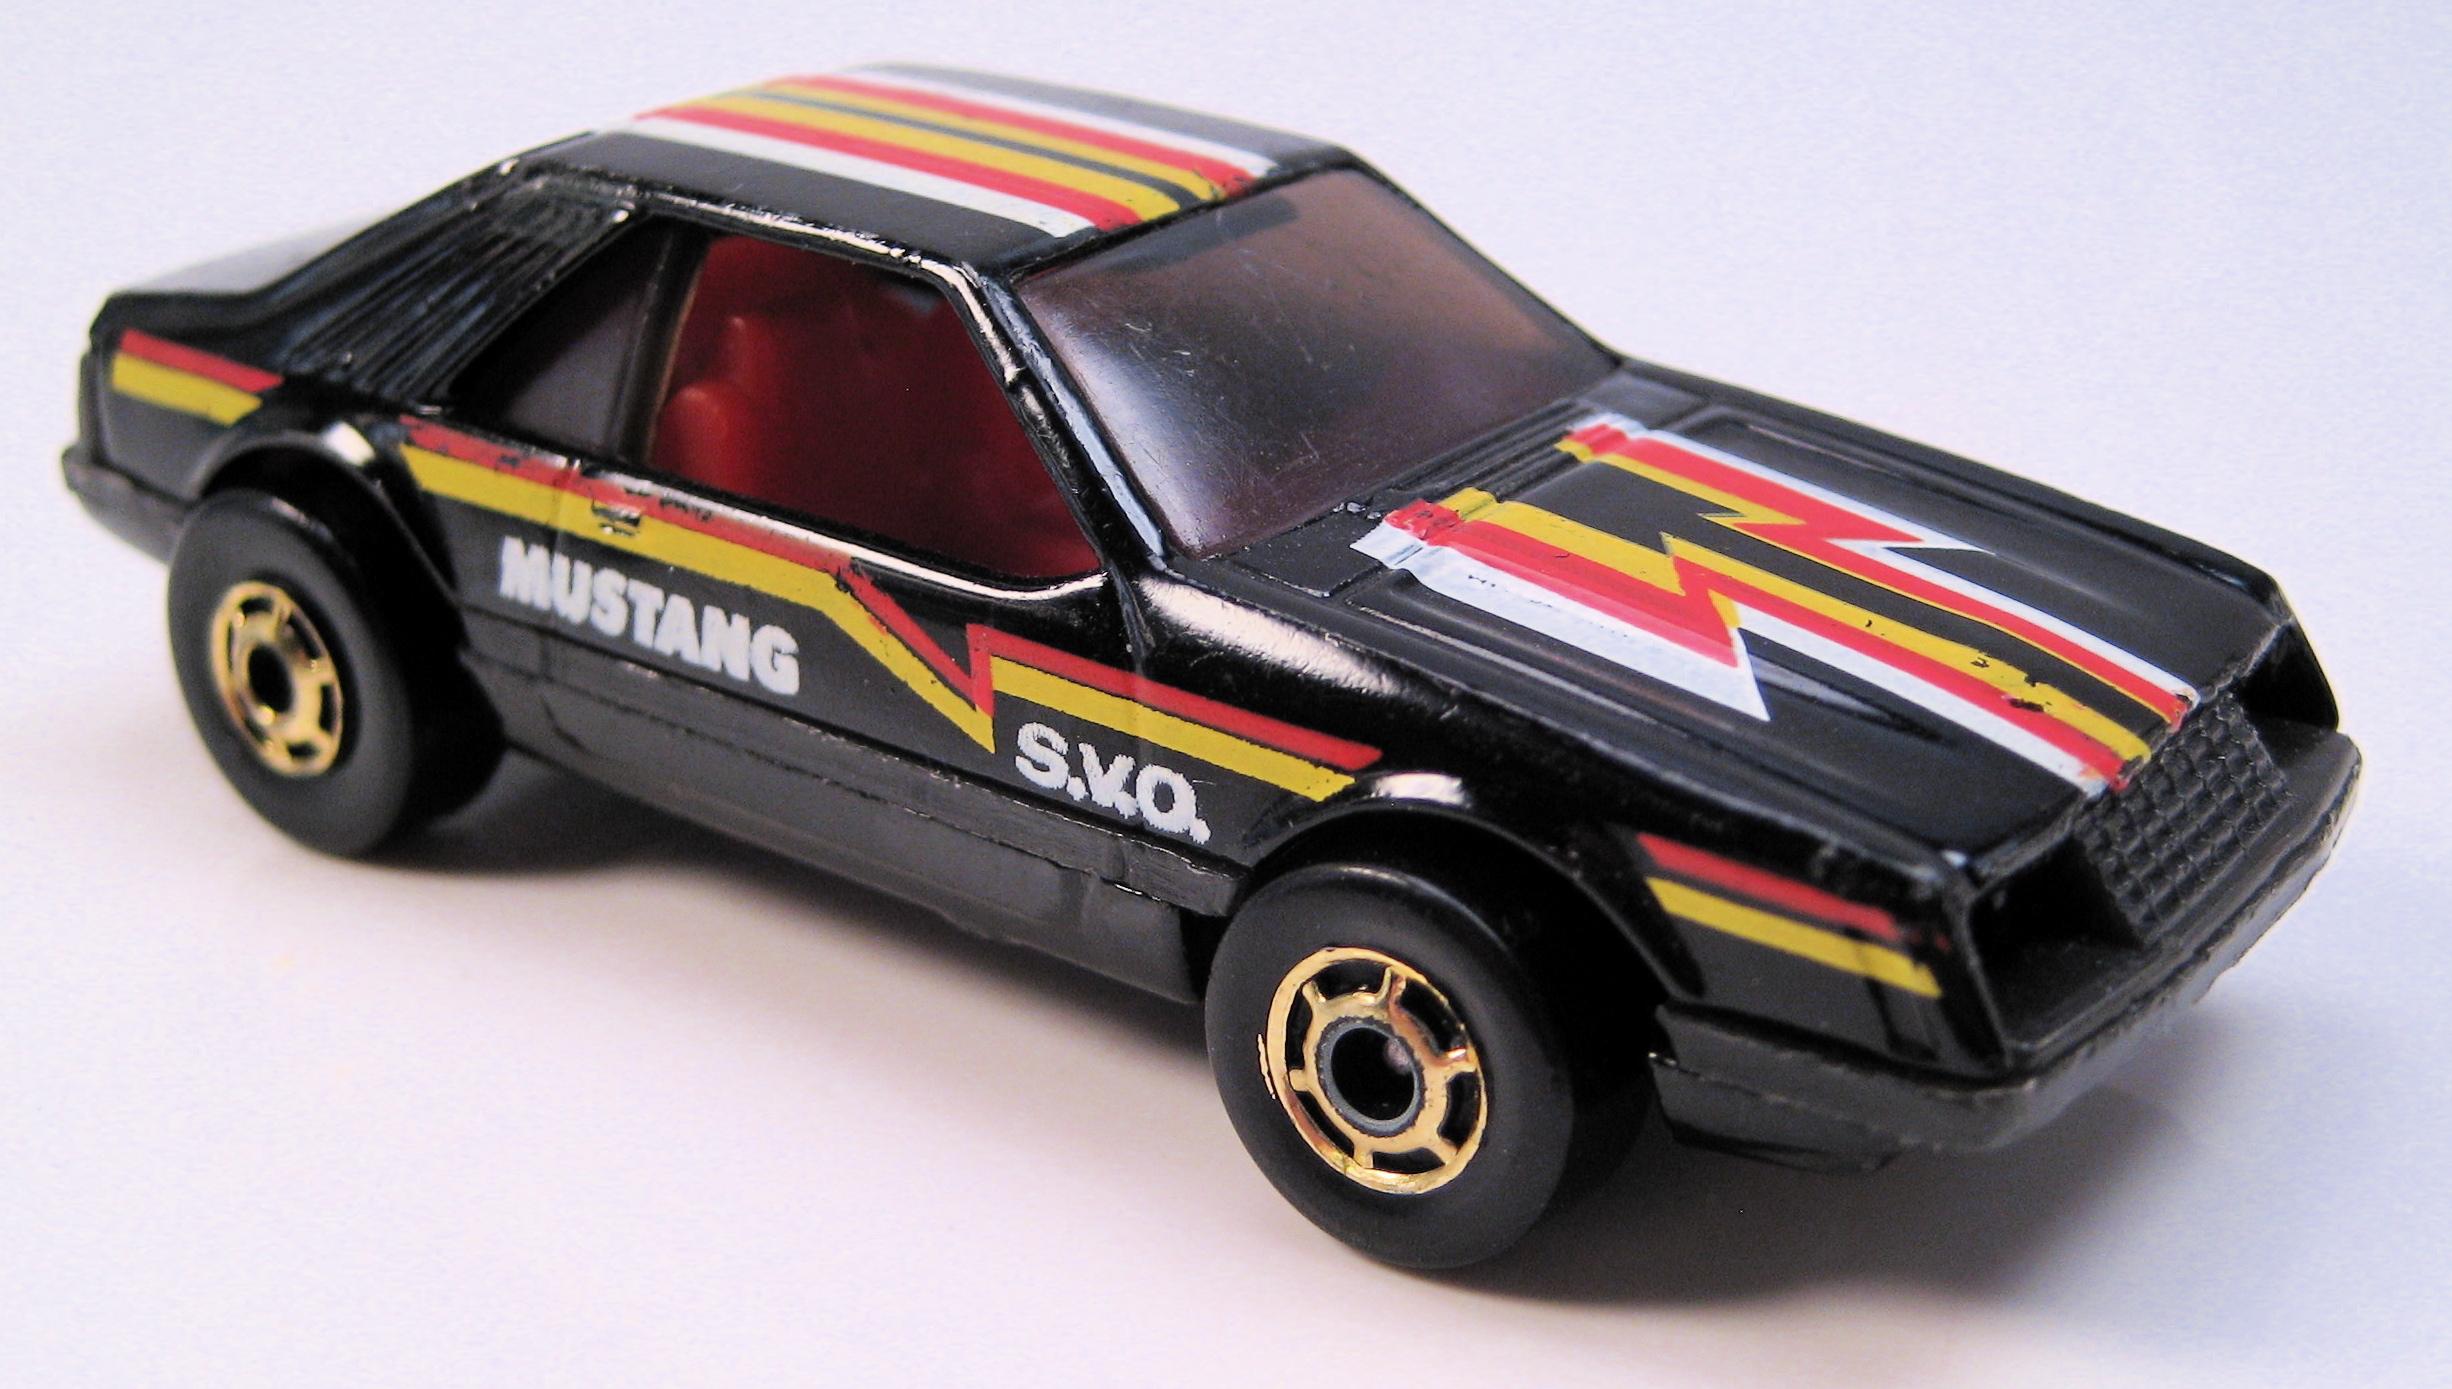 Mustang Svo Wheels File:mustang Svo Black Red Int